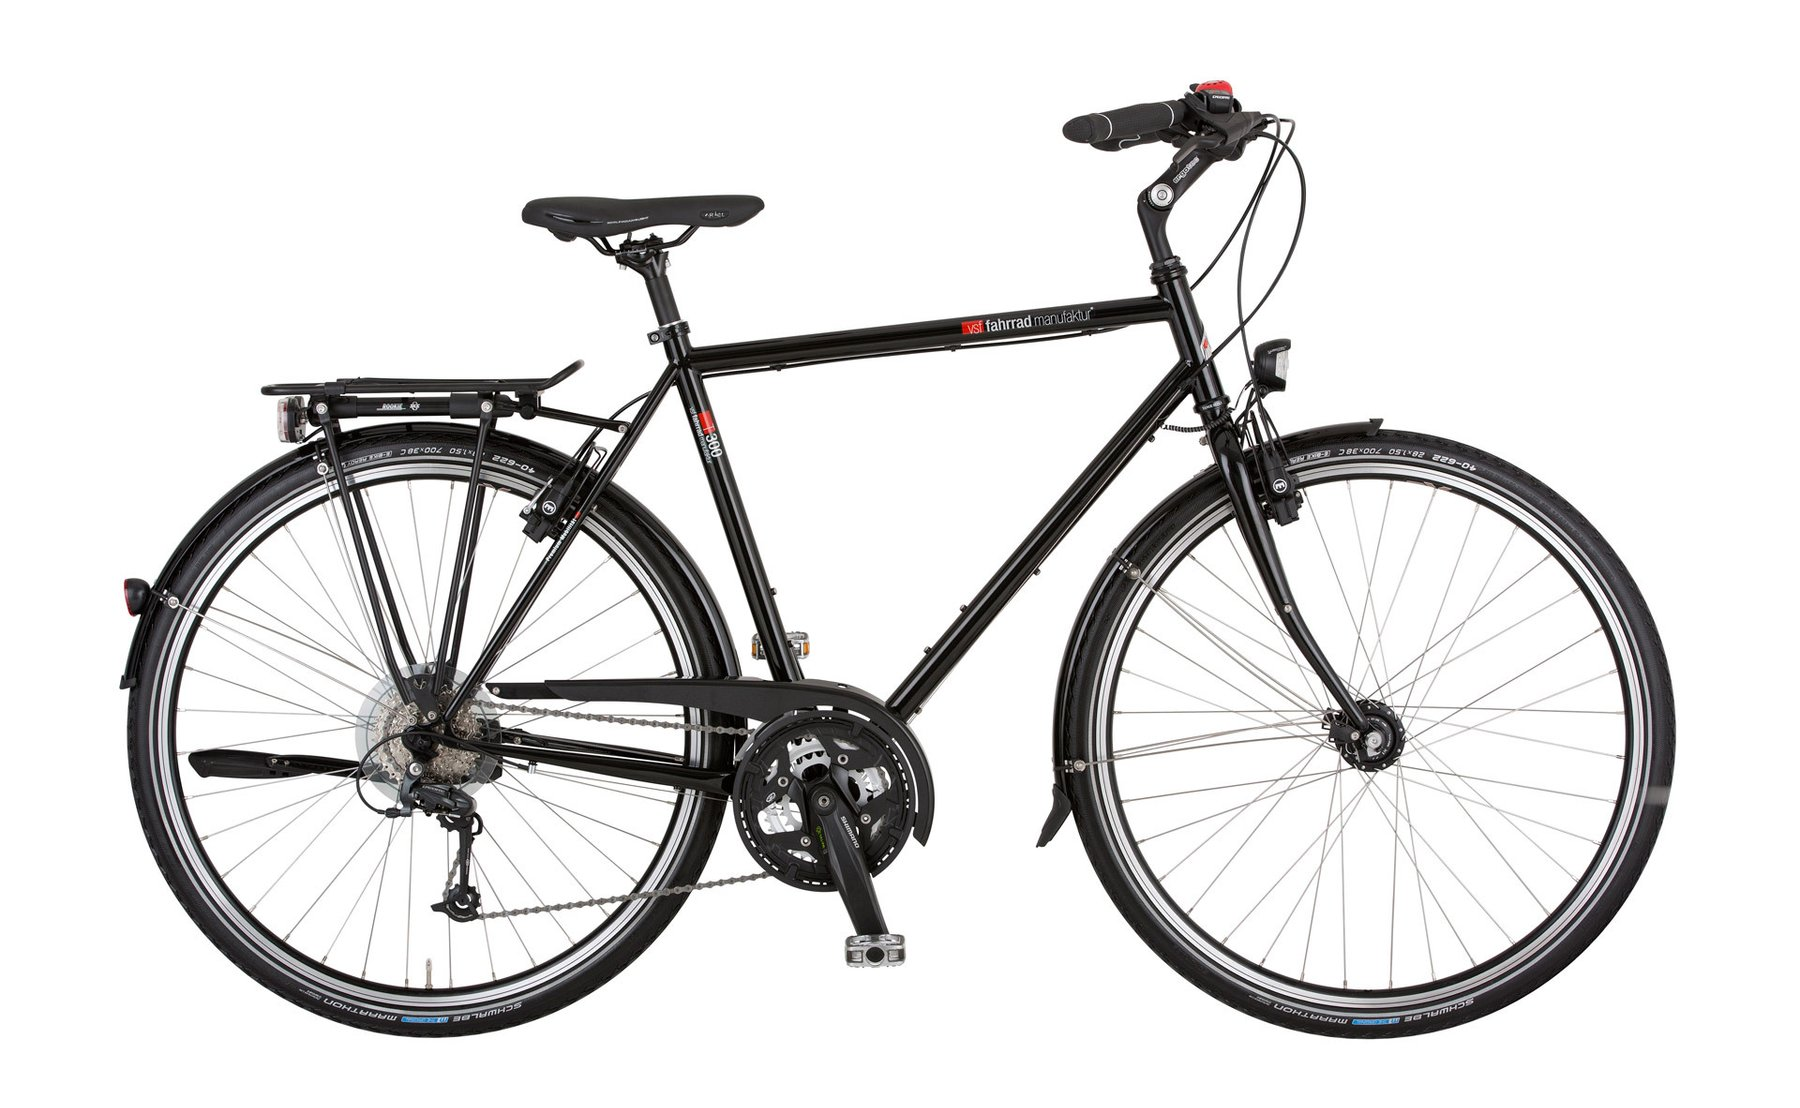 VSF-fahrradmanufaktur T-300 Auslaufmodell 28 Zoll -14% ...